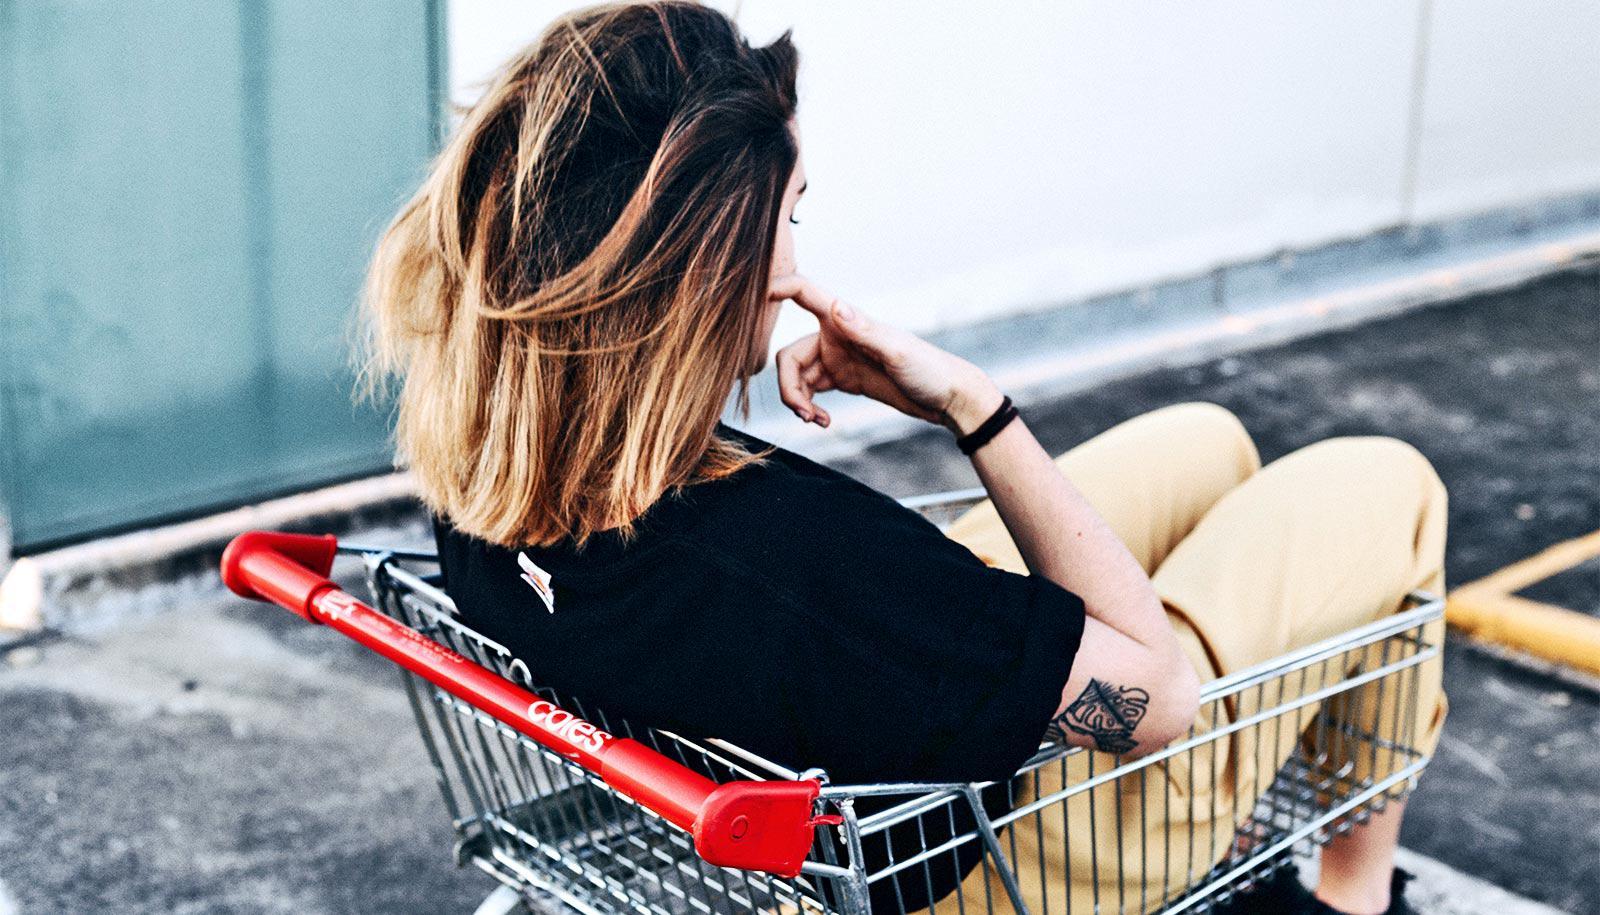 sitting in shopping cart